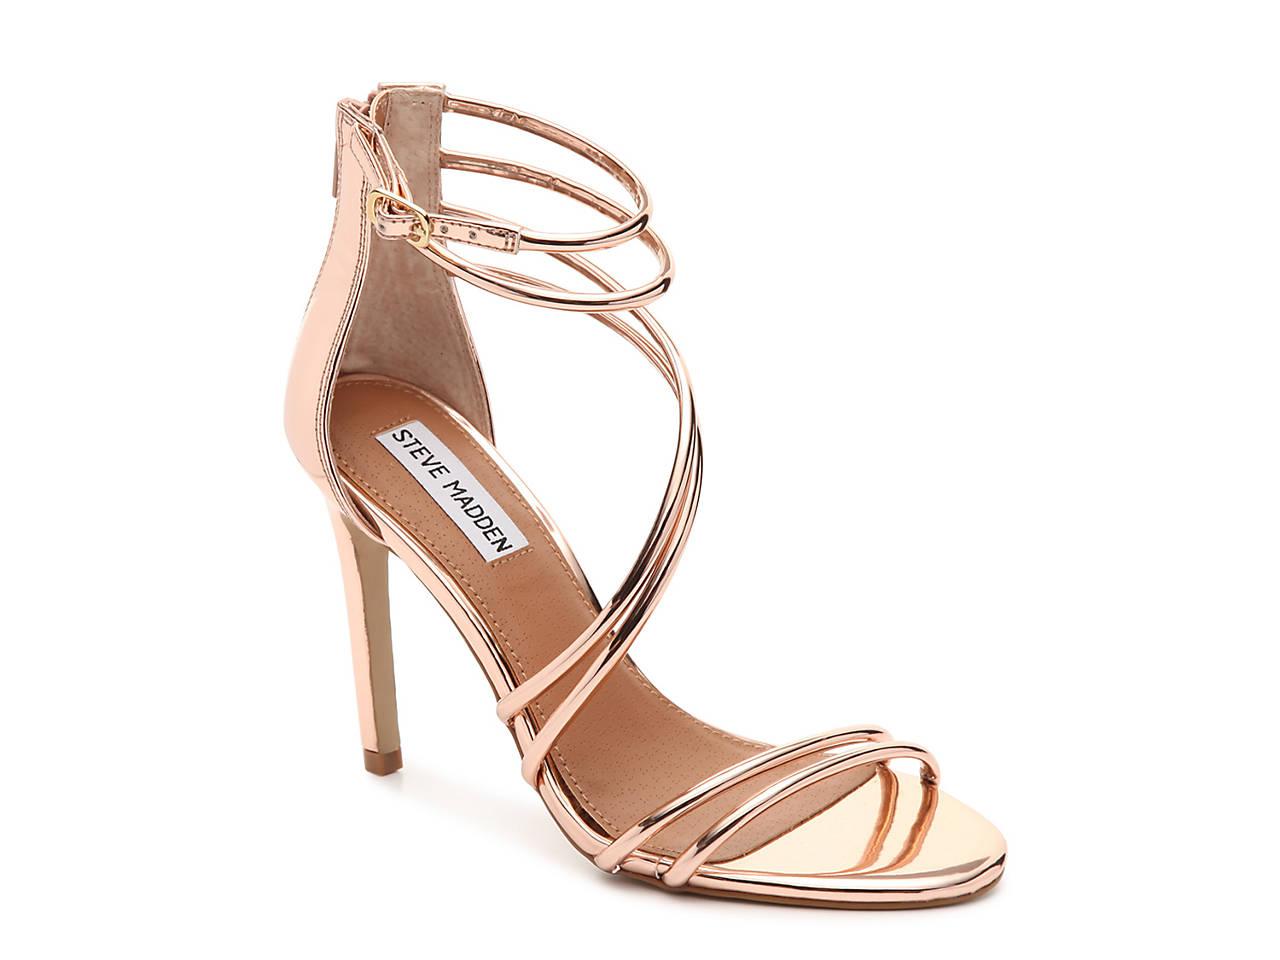 9a9b557c47 Steve Madden Fico Sandal Women's Shoes | DSW